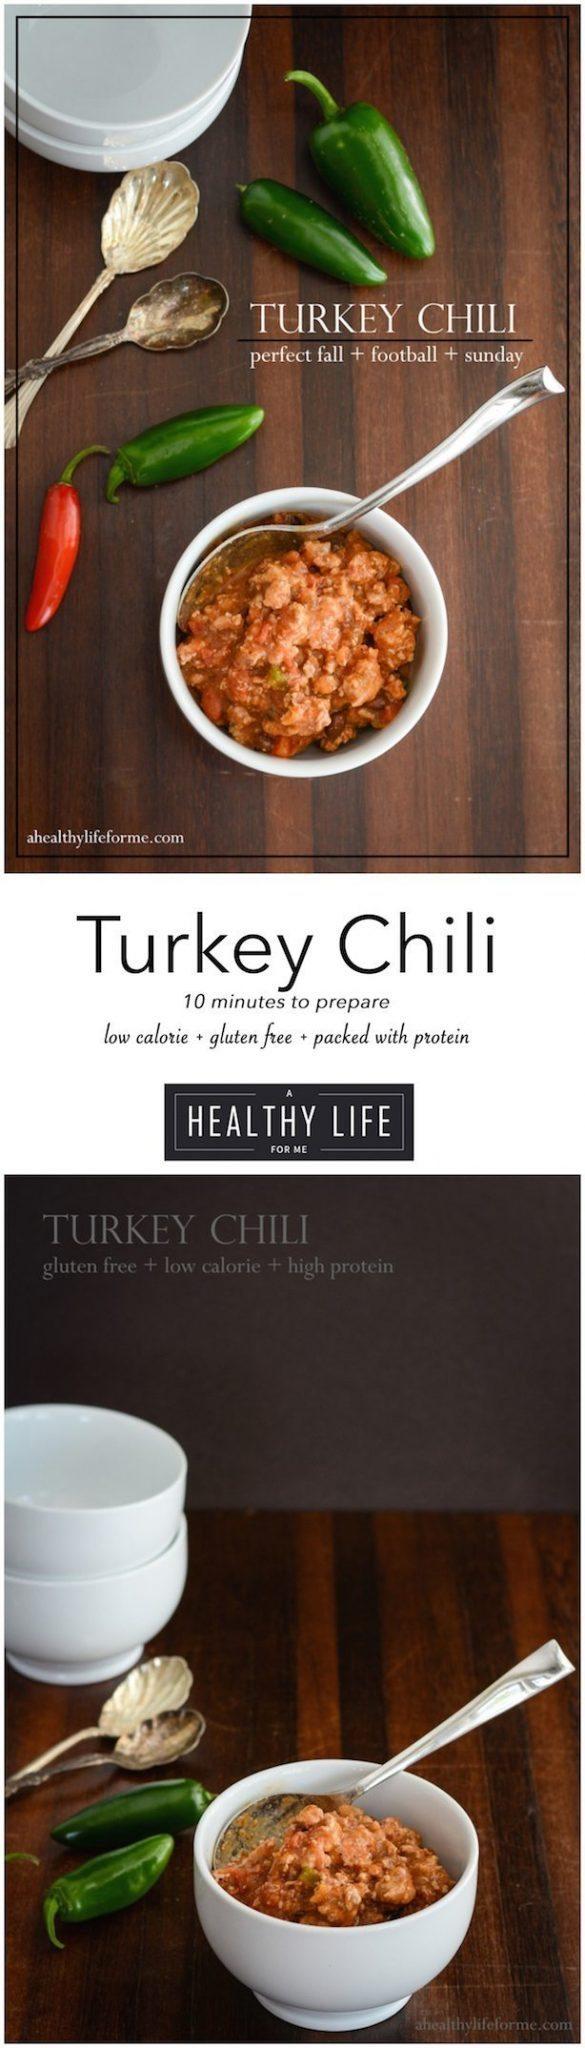 Turkey Chili Recipe Gluten Free | ahealthylifeforme.com